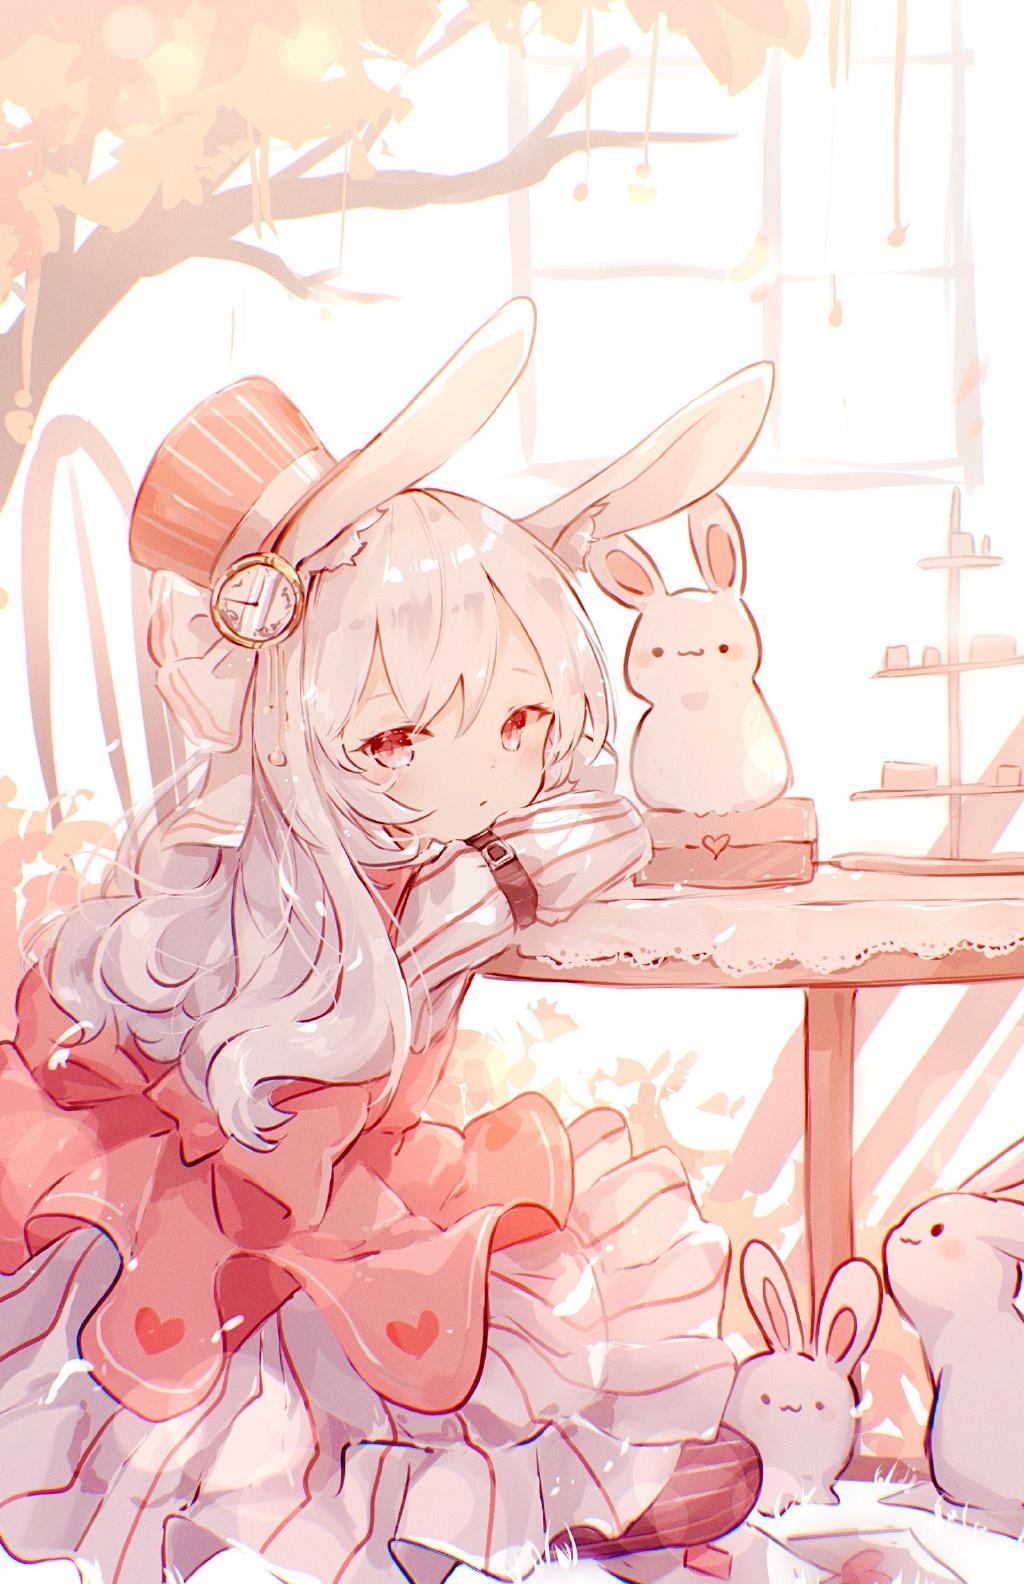 P站精选&兔兔那么可爱!怎么可以…中秋节兔耳娘壁纸特辑-Zhaiuu.Com-宅尤尤